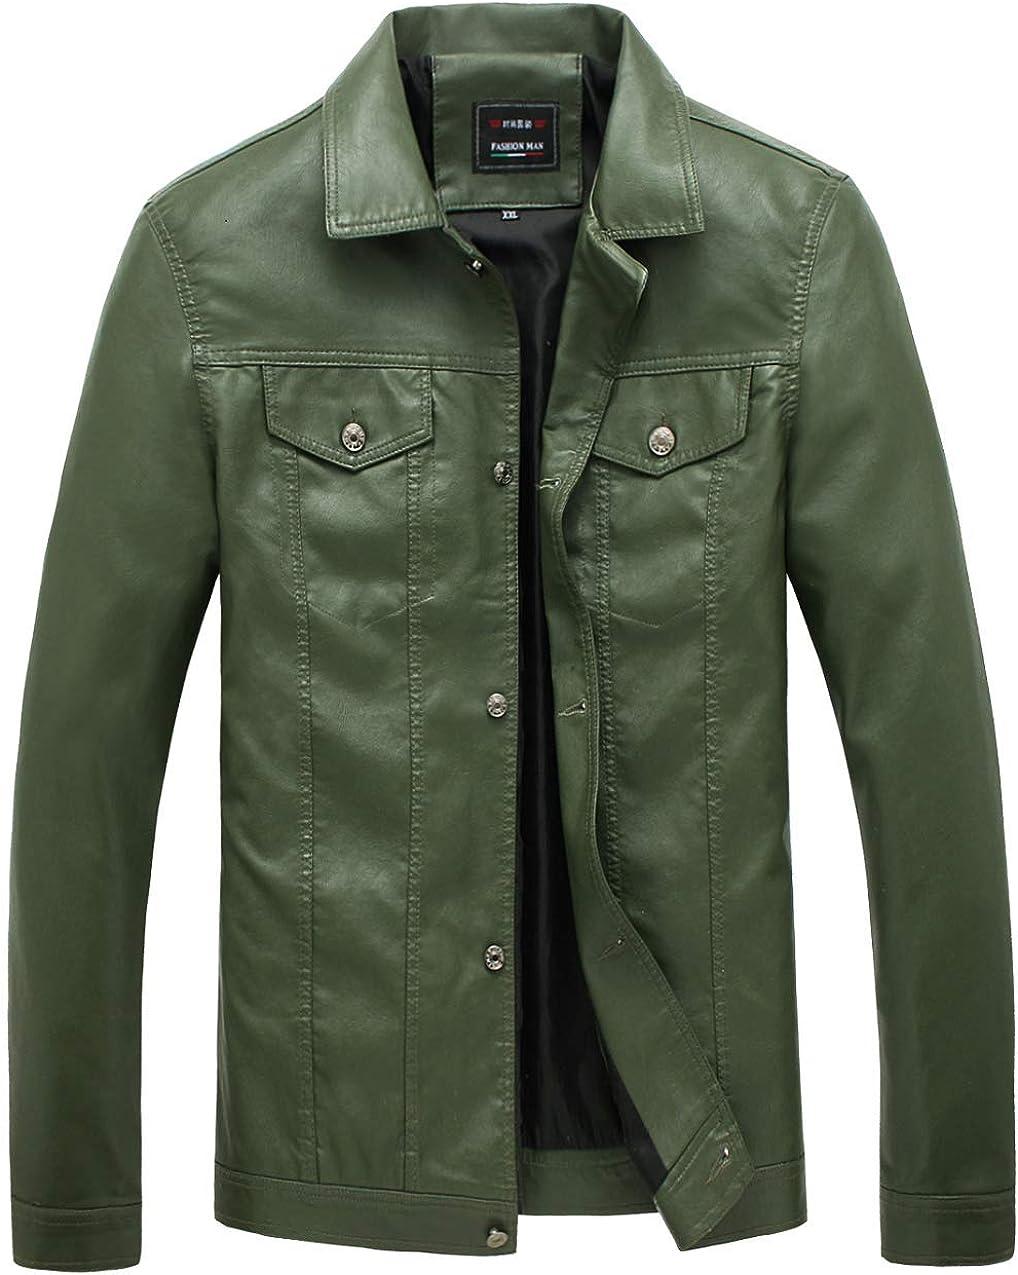 KIWEN Mens Button Down PU Leather Collar Jacket Casual Wear